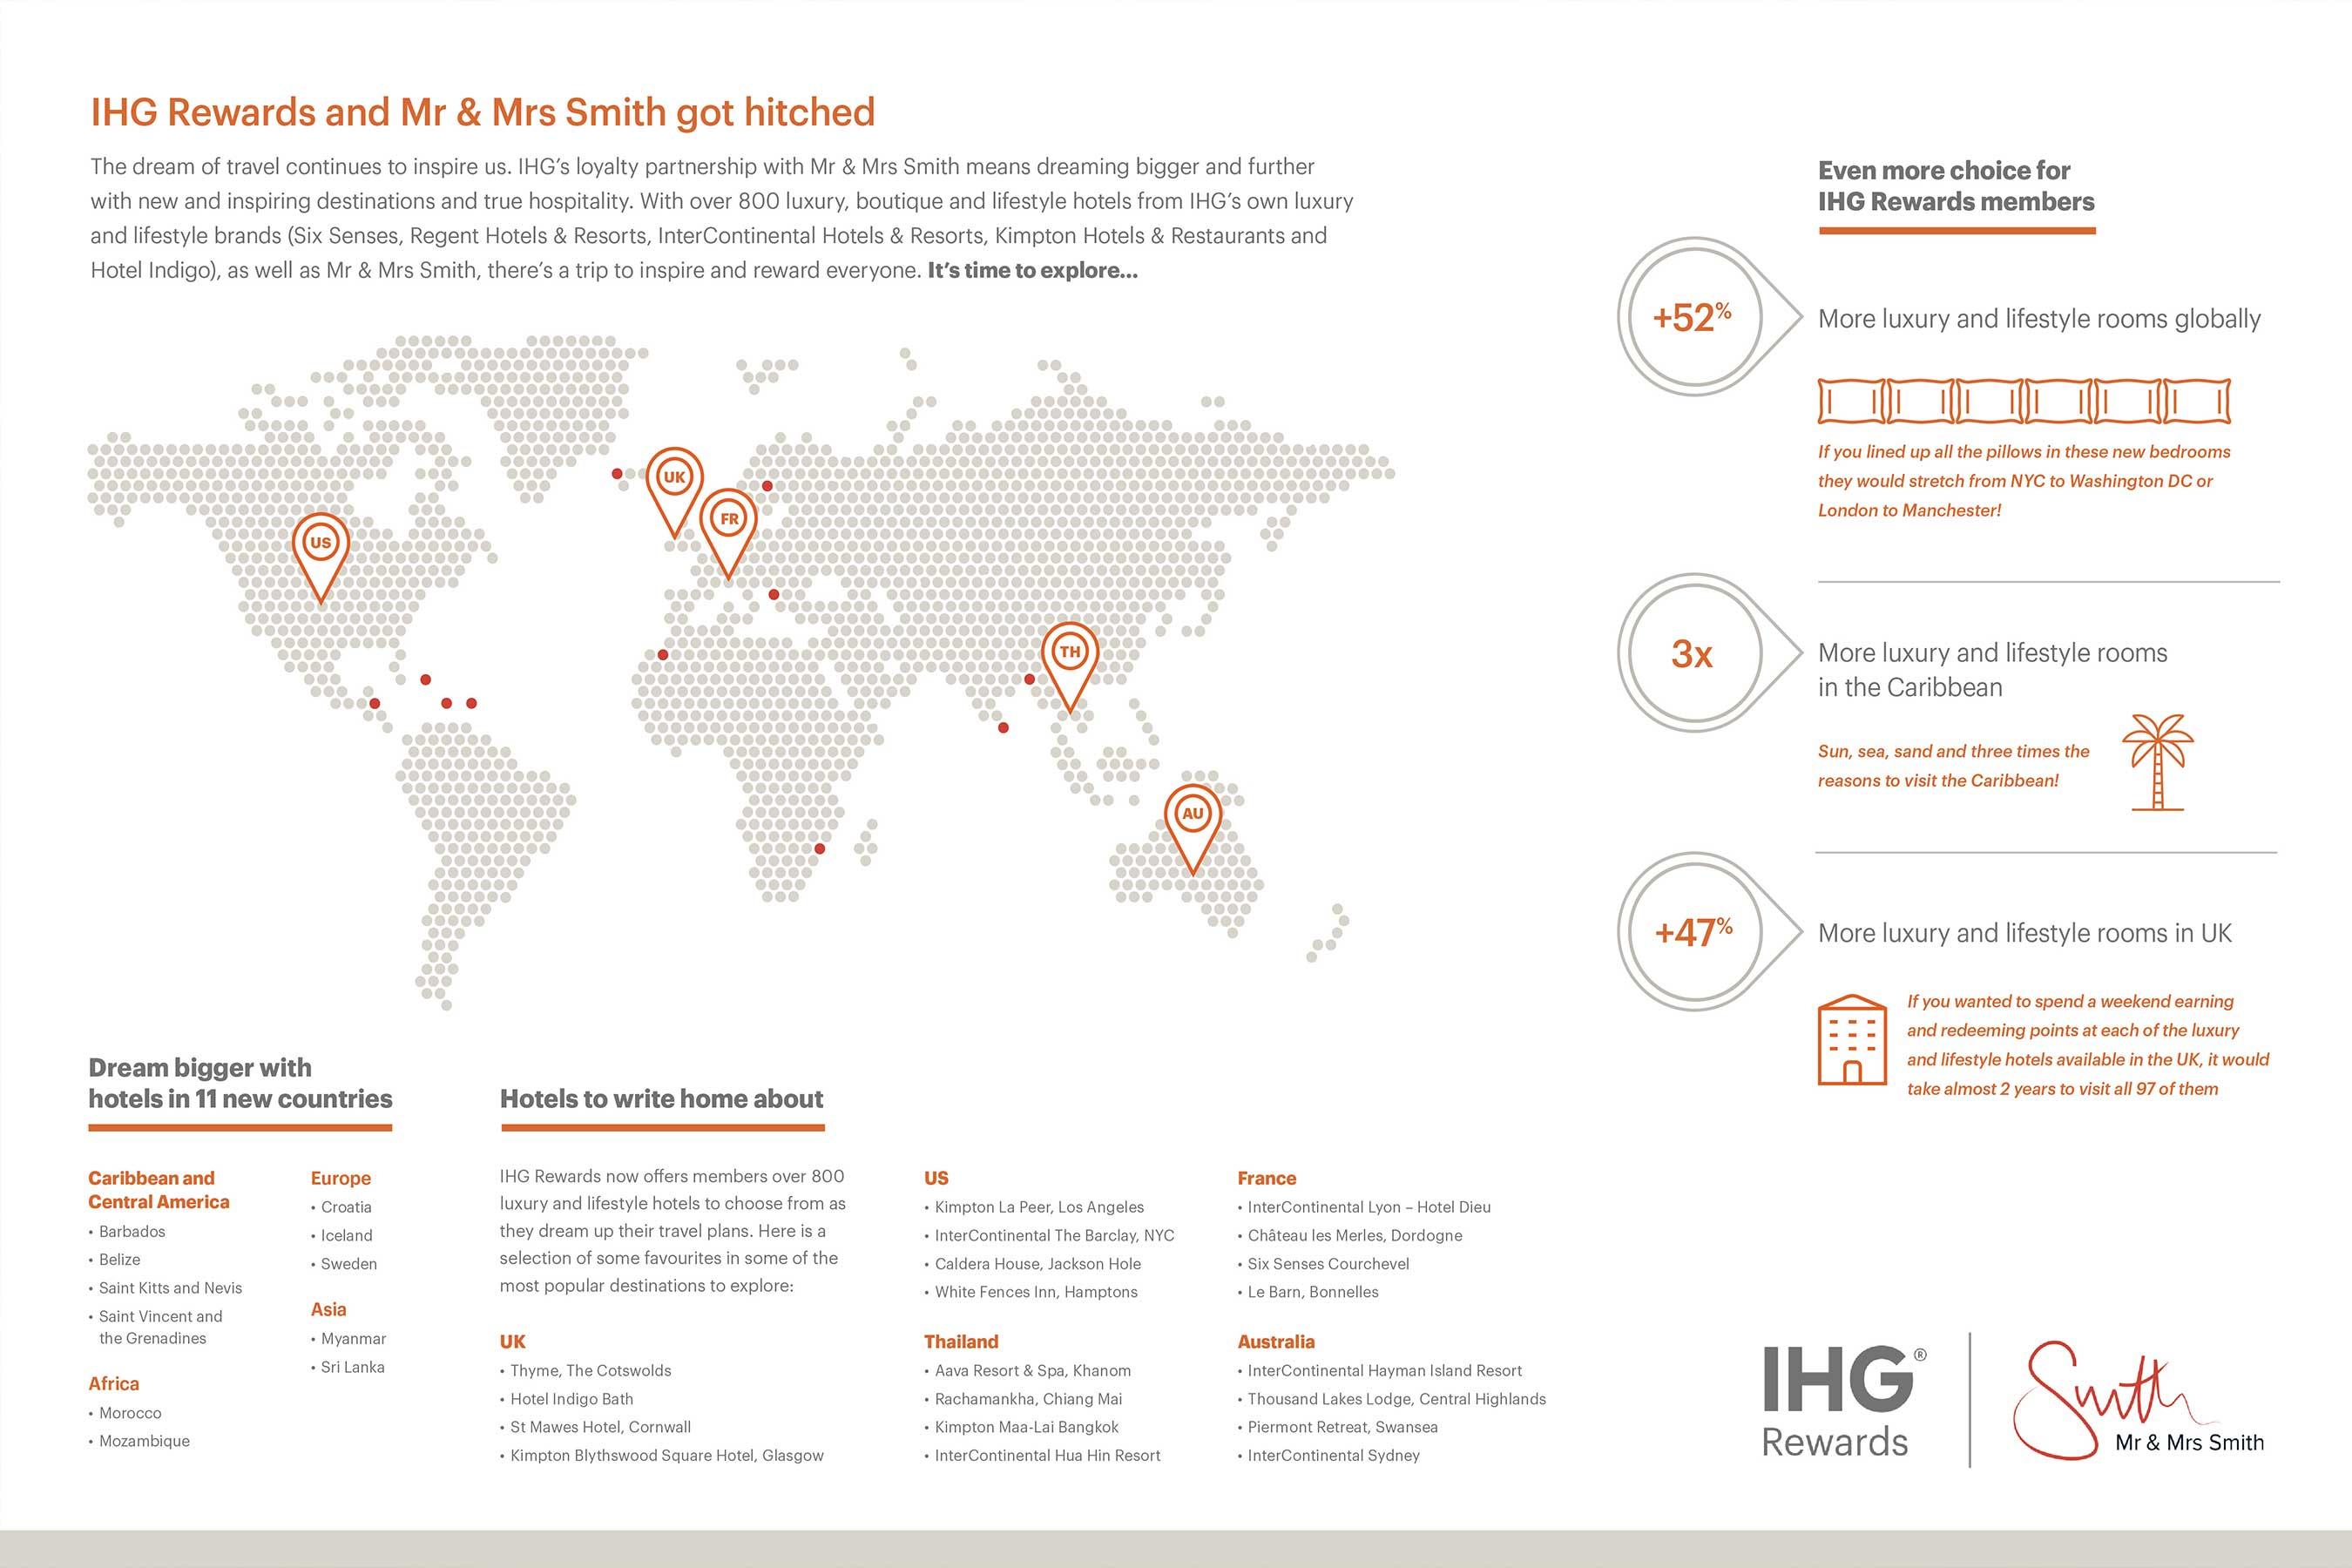 IHG Rewards x Mr & Mrs Smith infographic